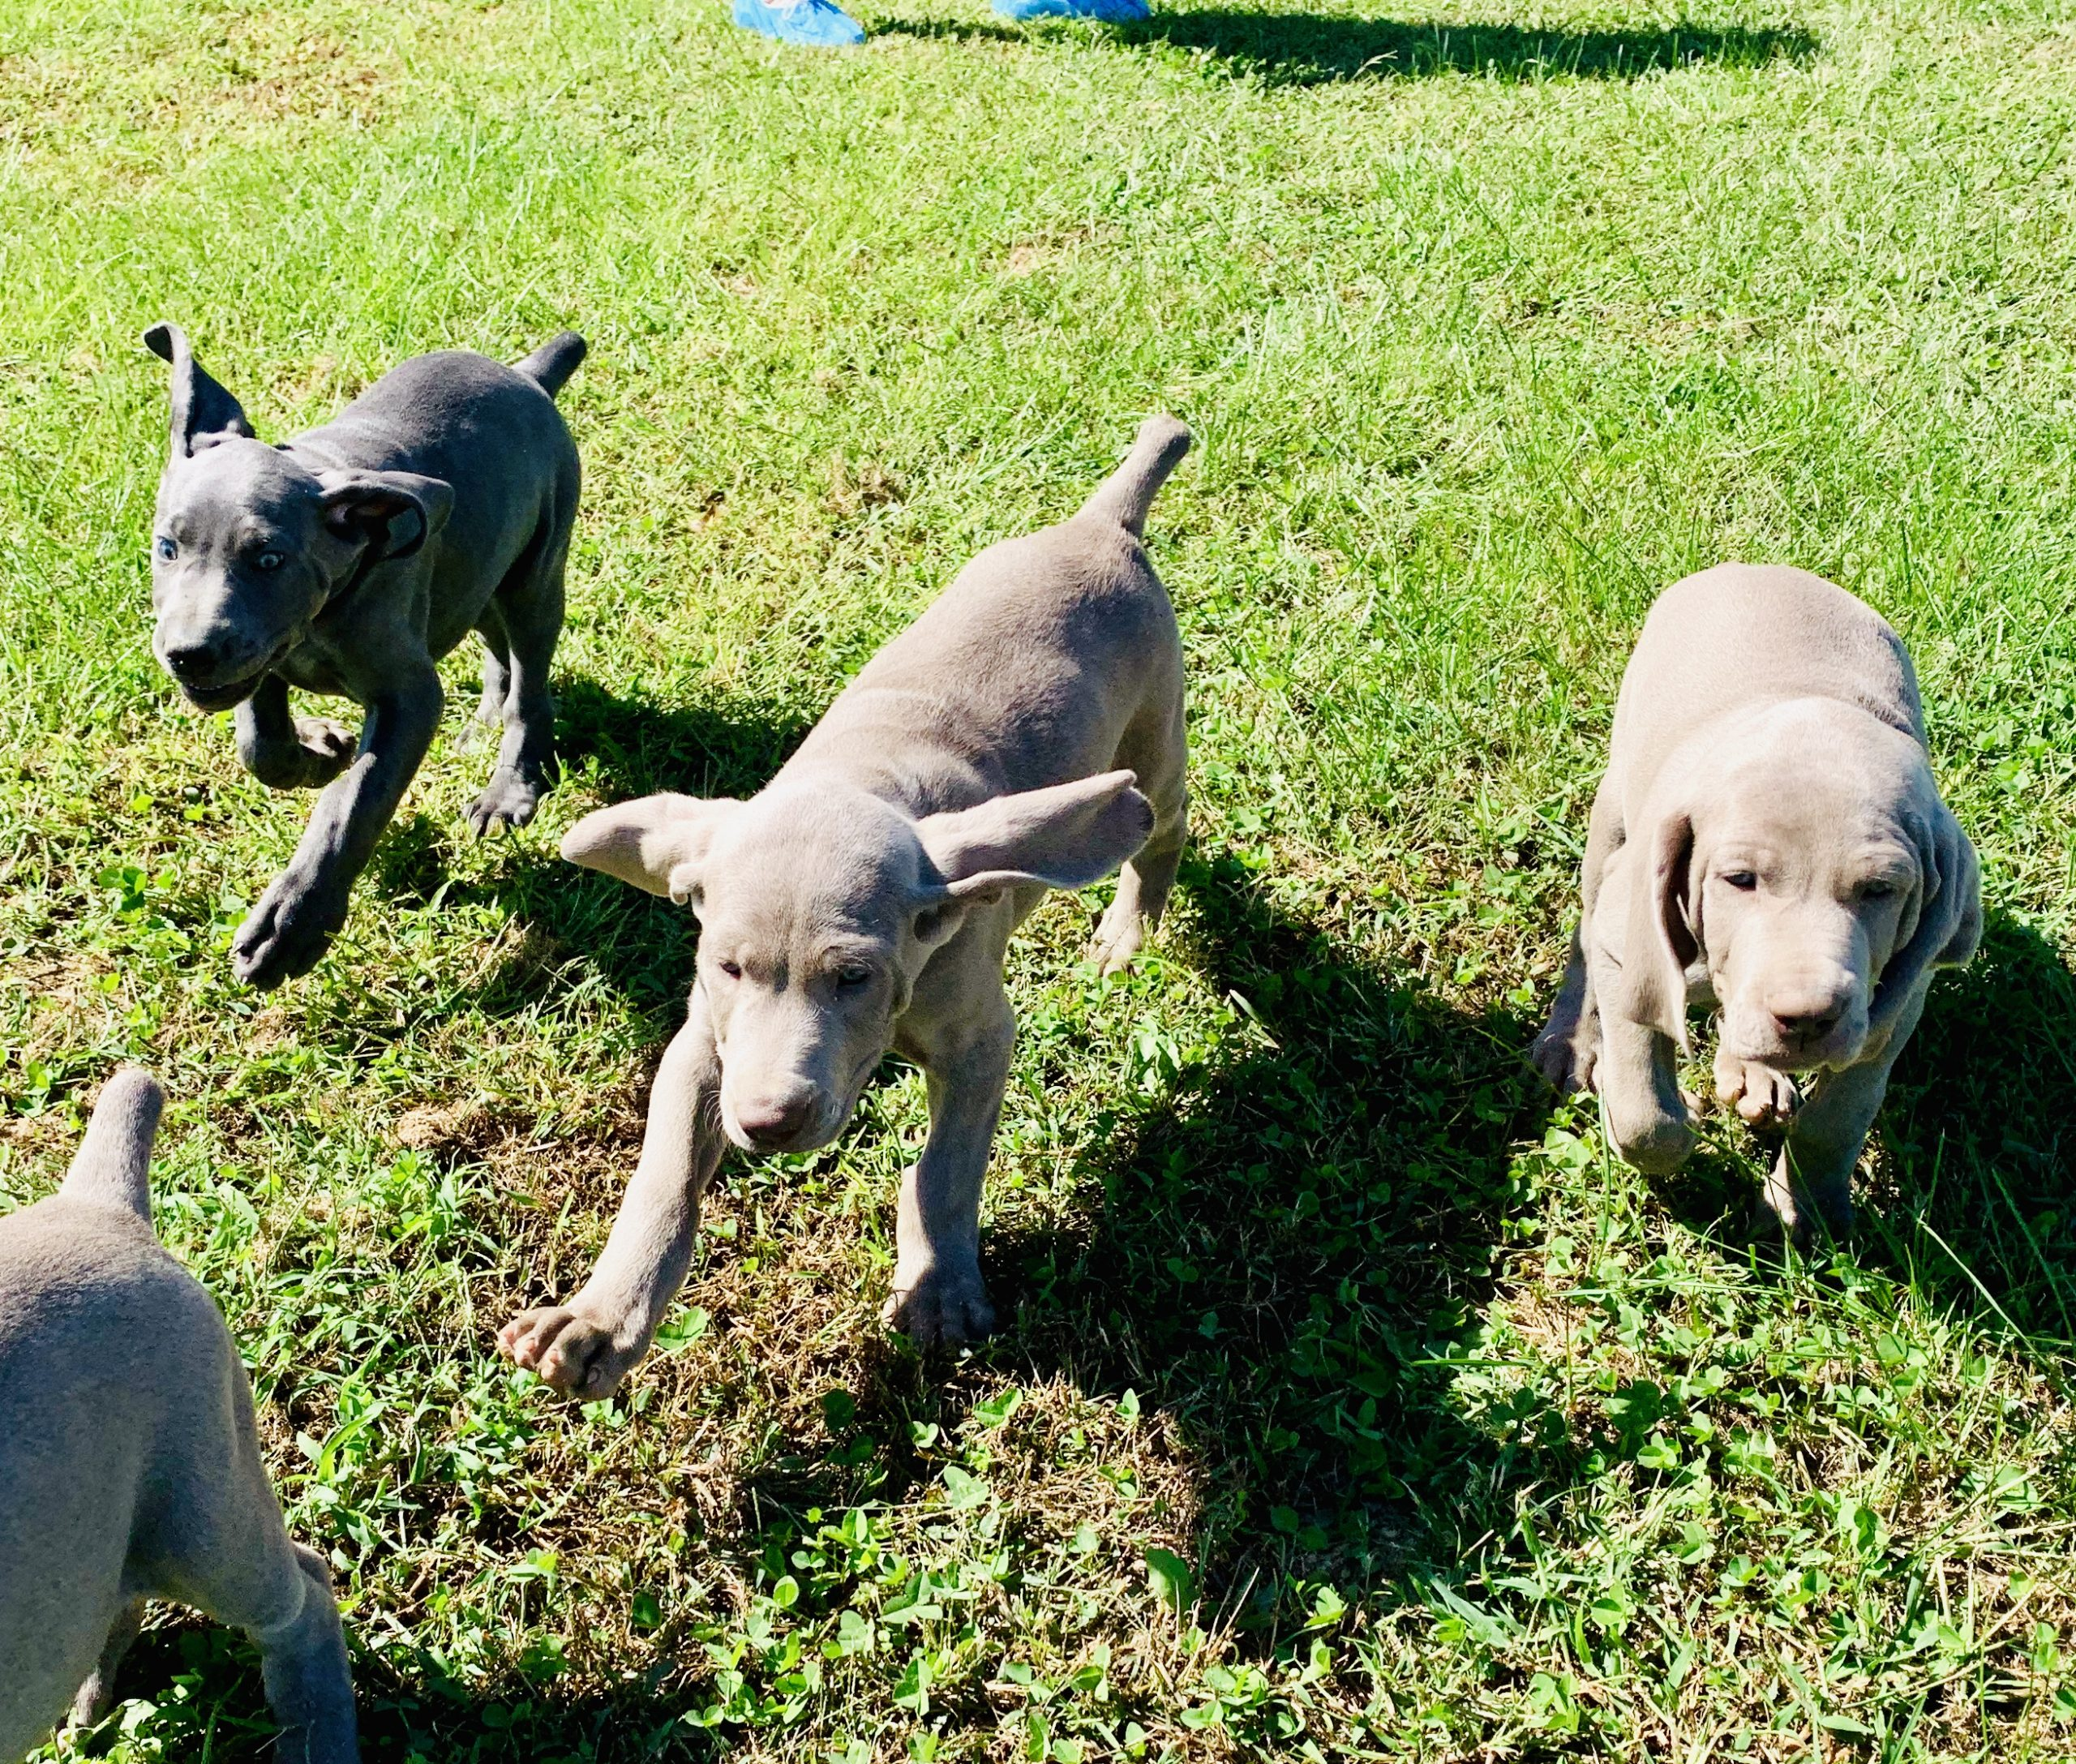 Weimaranger puppies playing